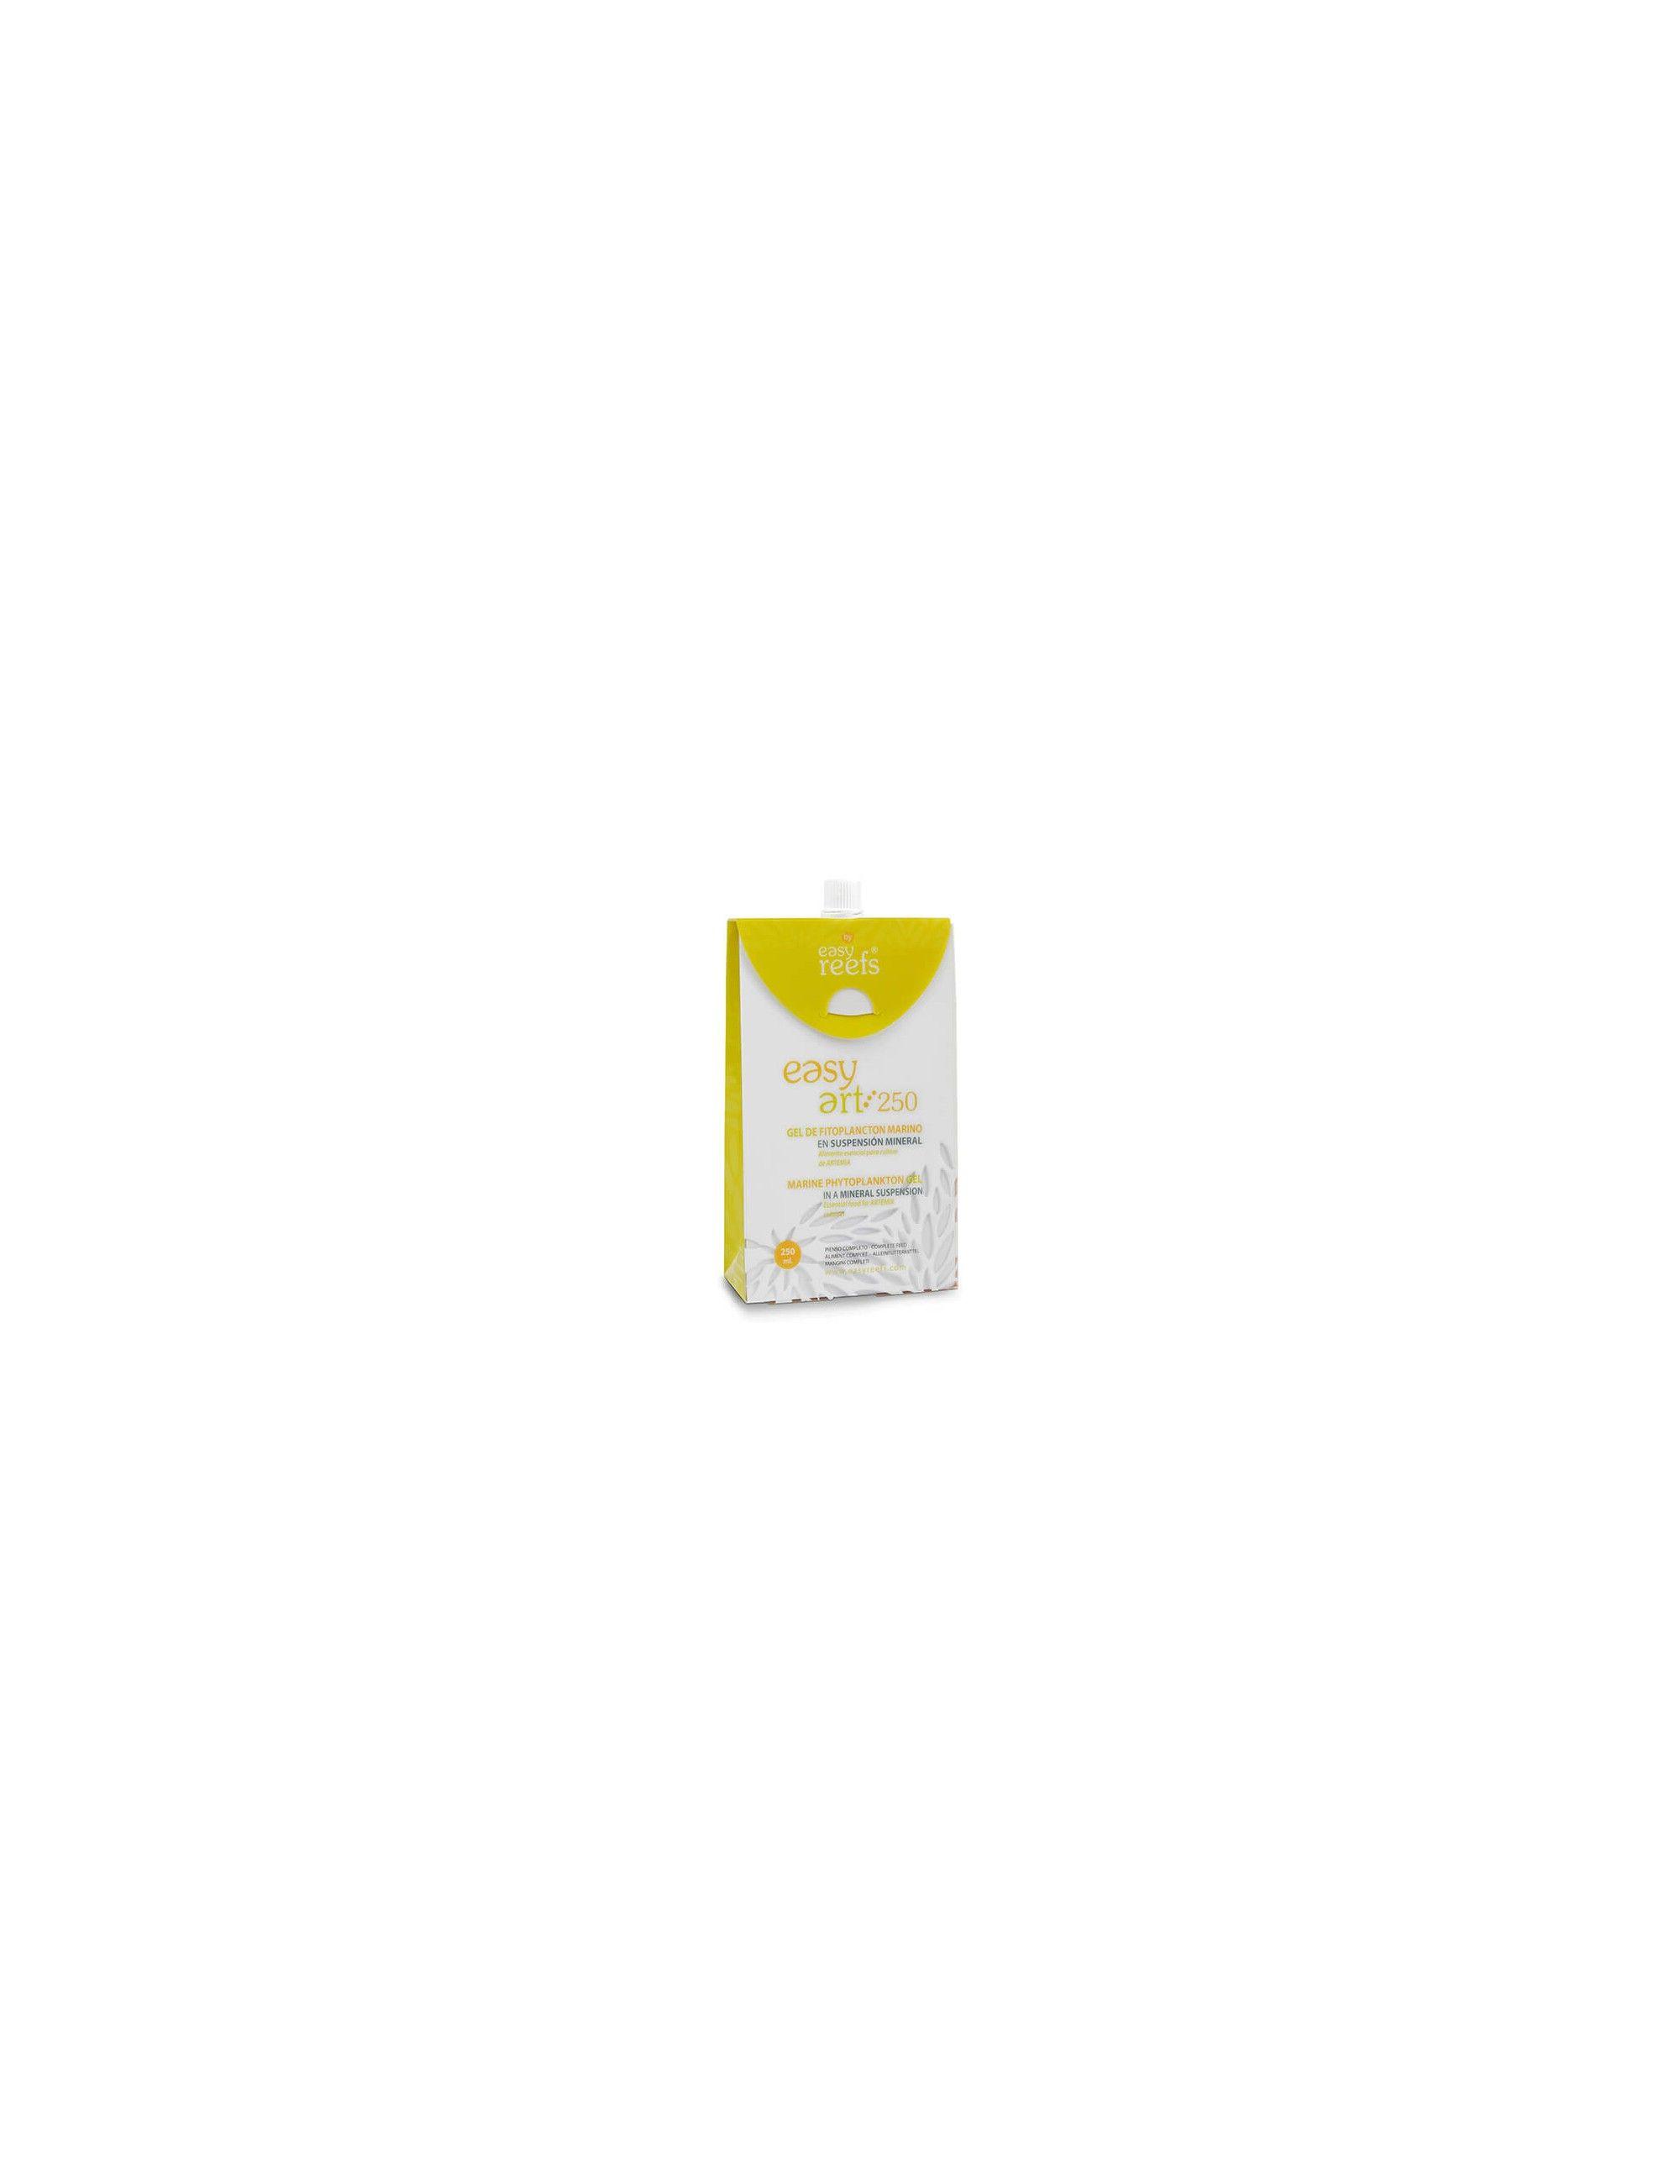 Easy Reefs - Easyart 250 - 250 ml - Phytoplancton liquide